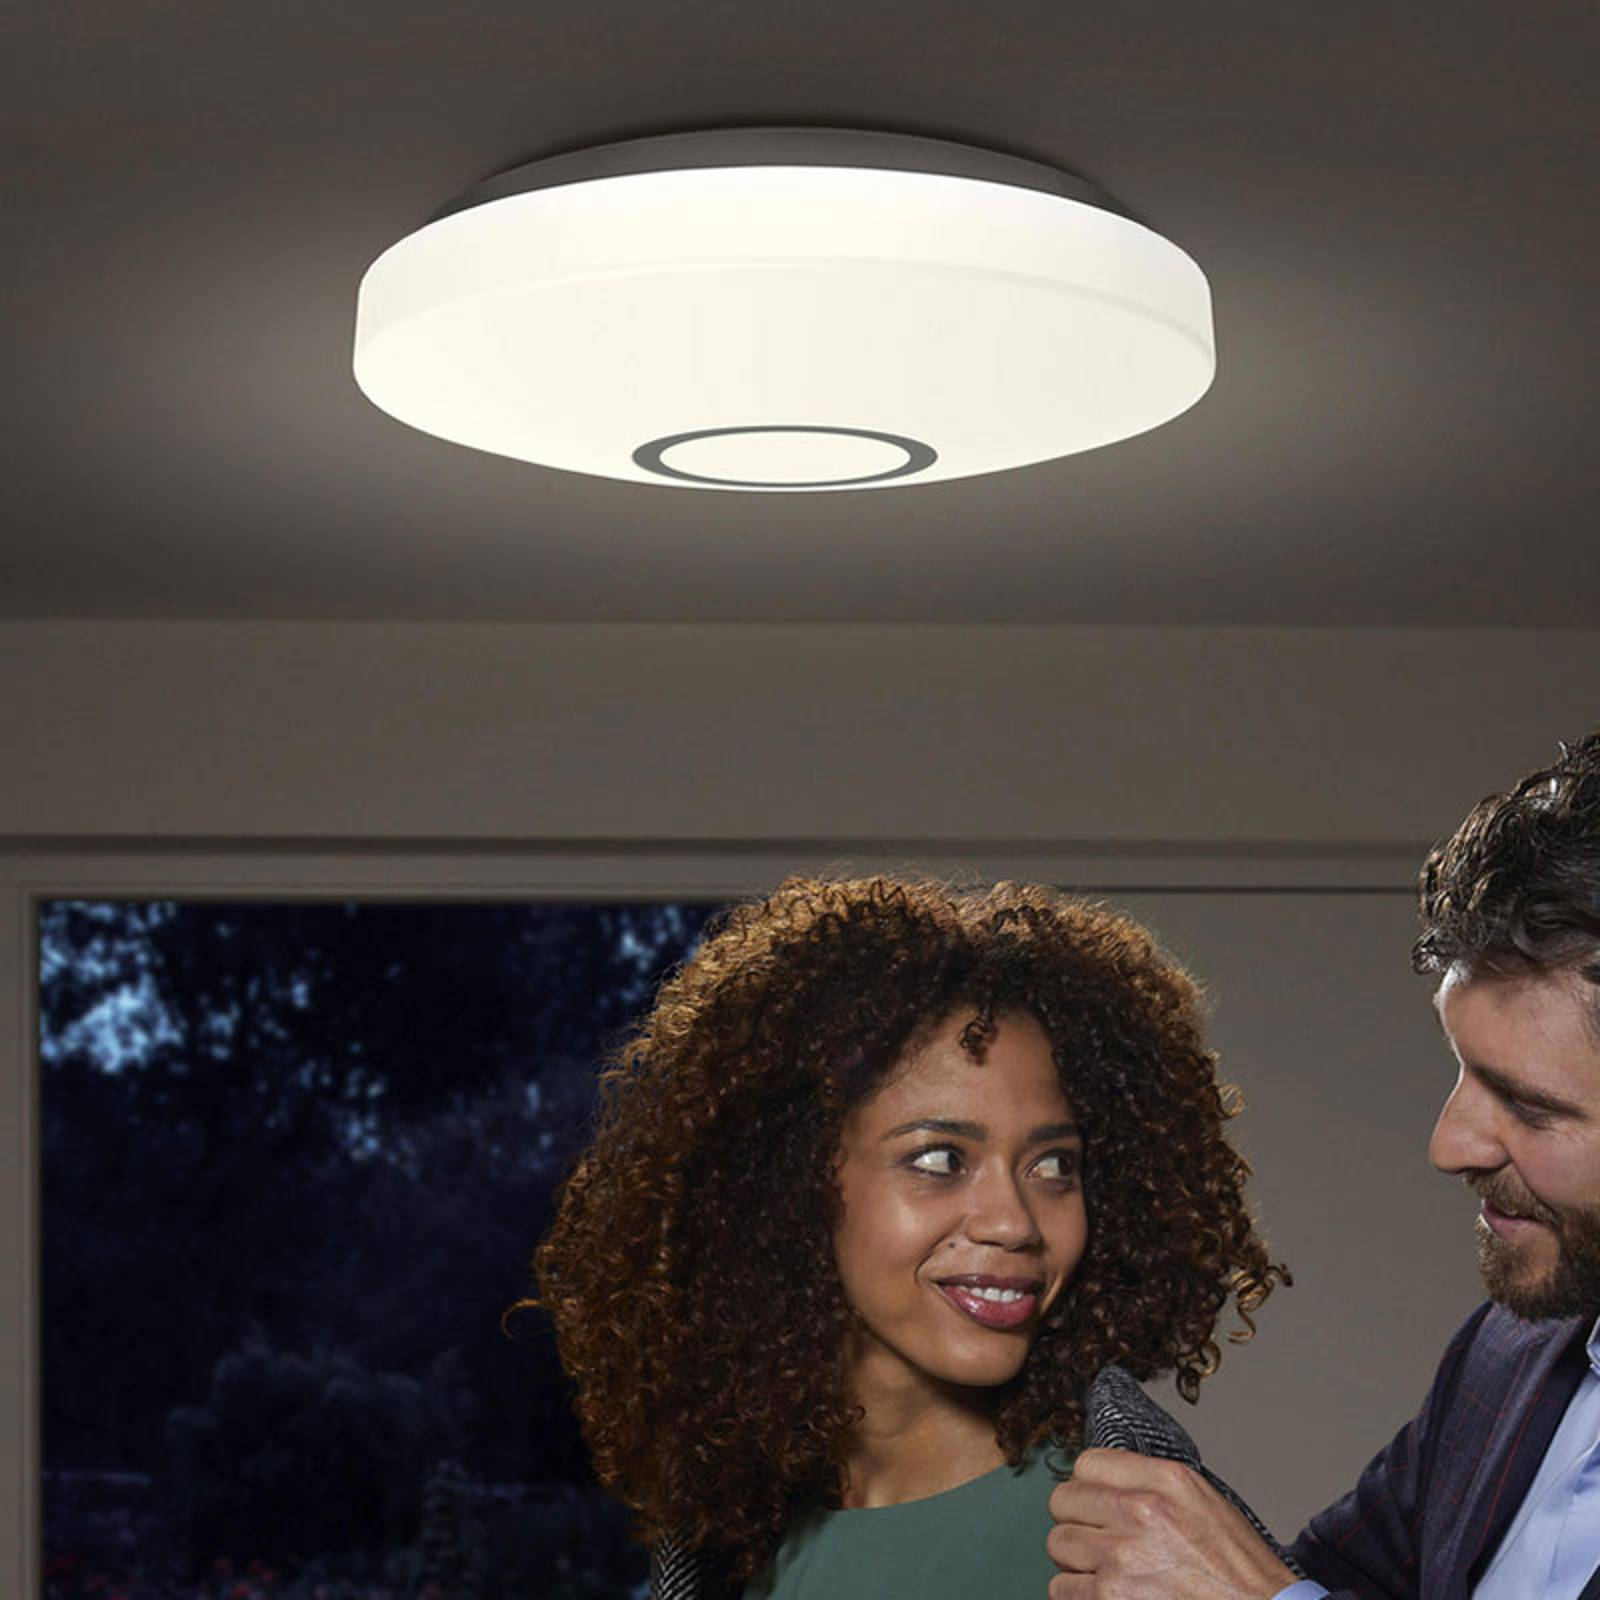 Ledvance Orbis Sensor plafoniera LED Ø 34cm